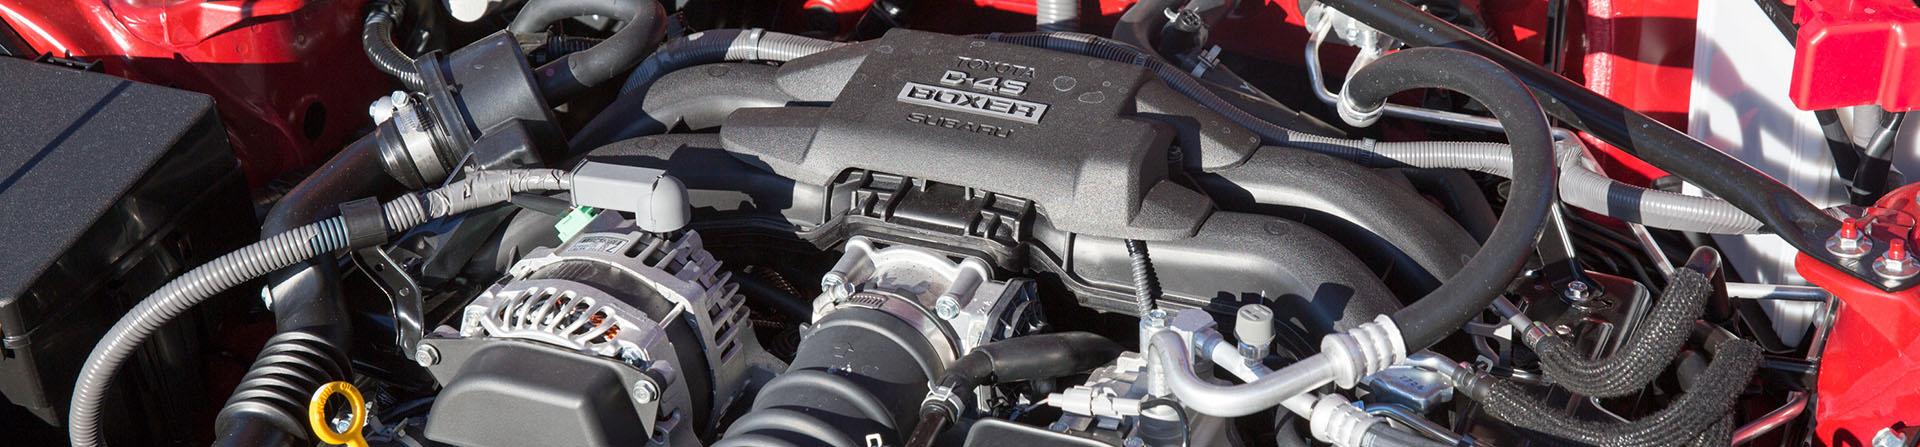 Subaru BRZ Image 3